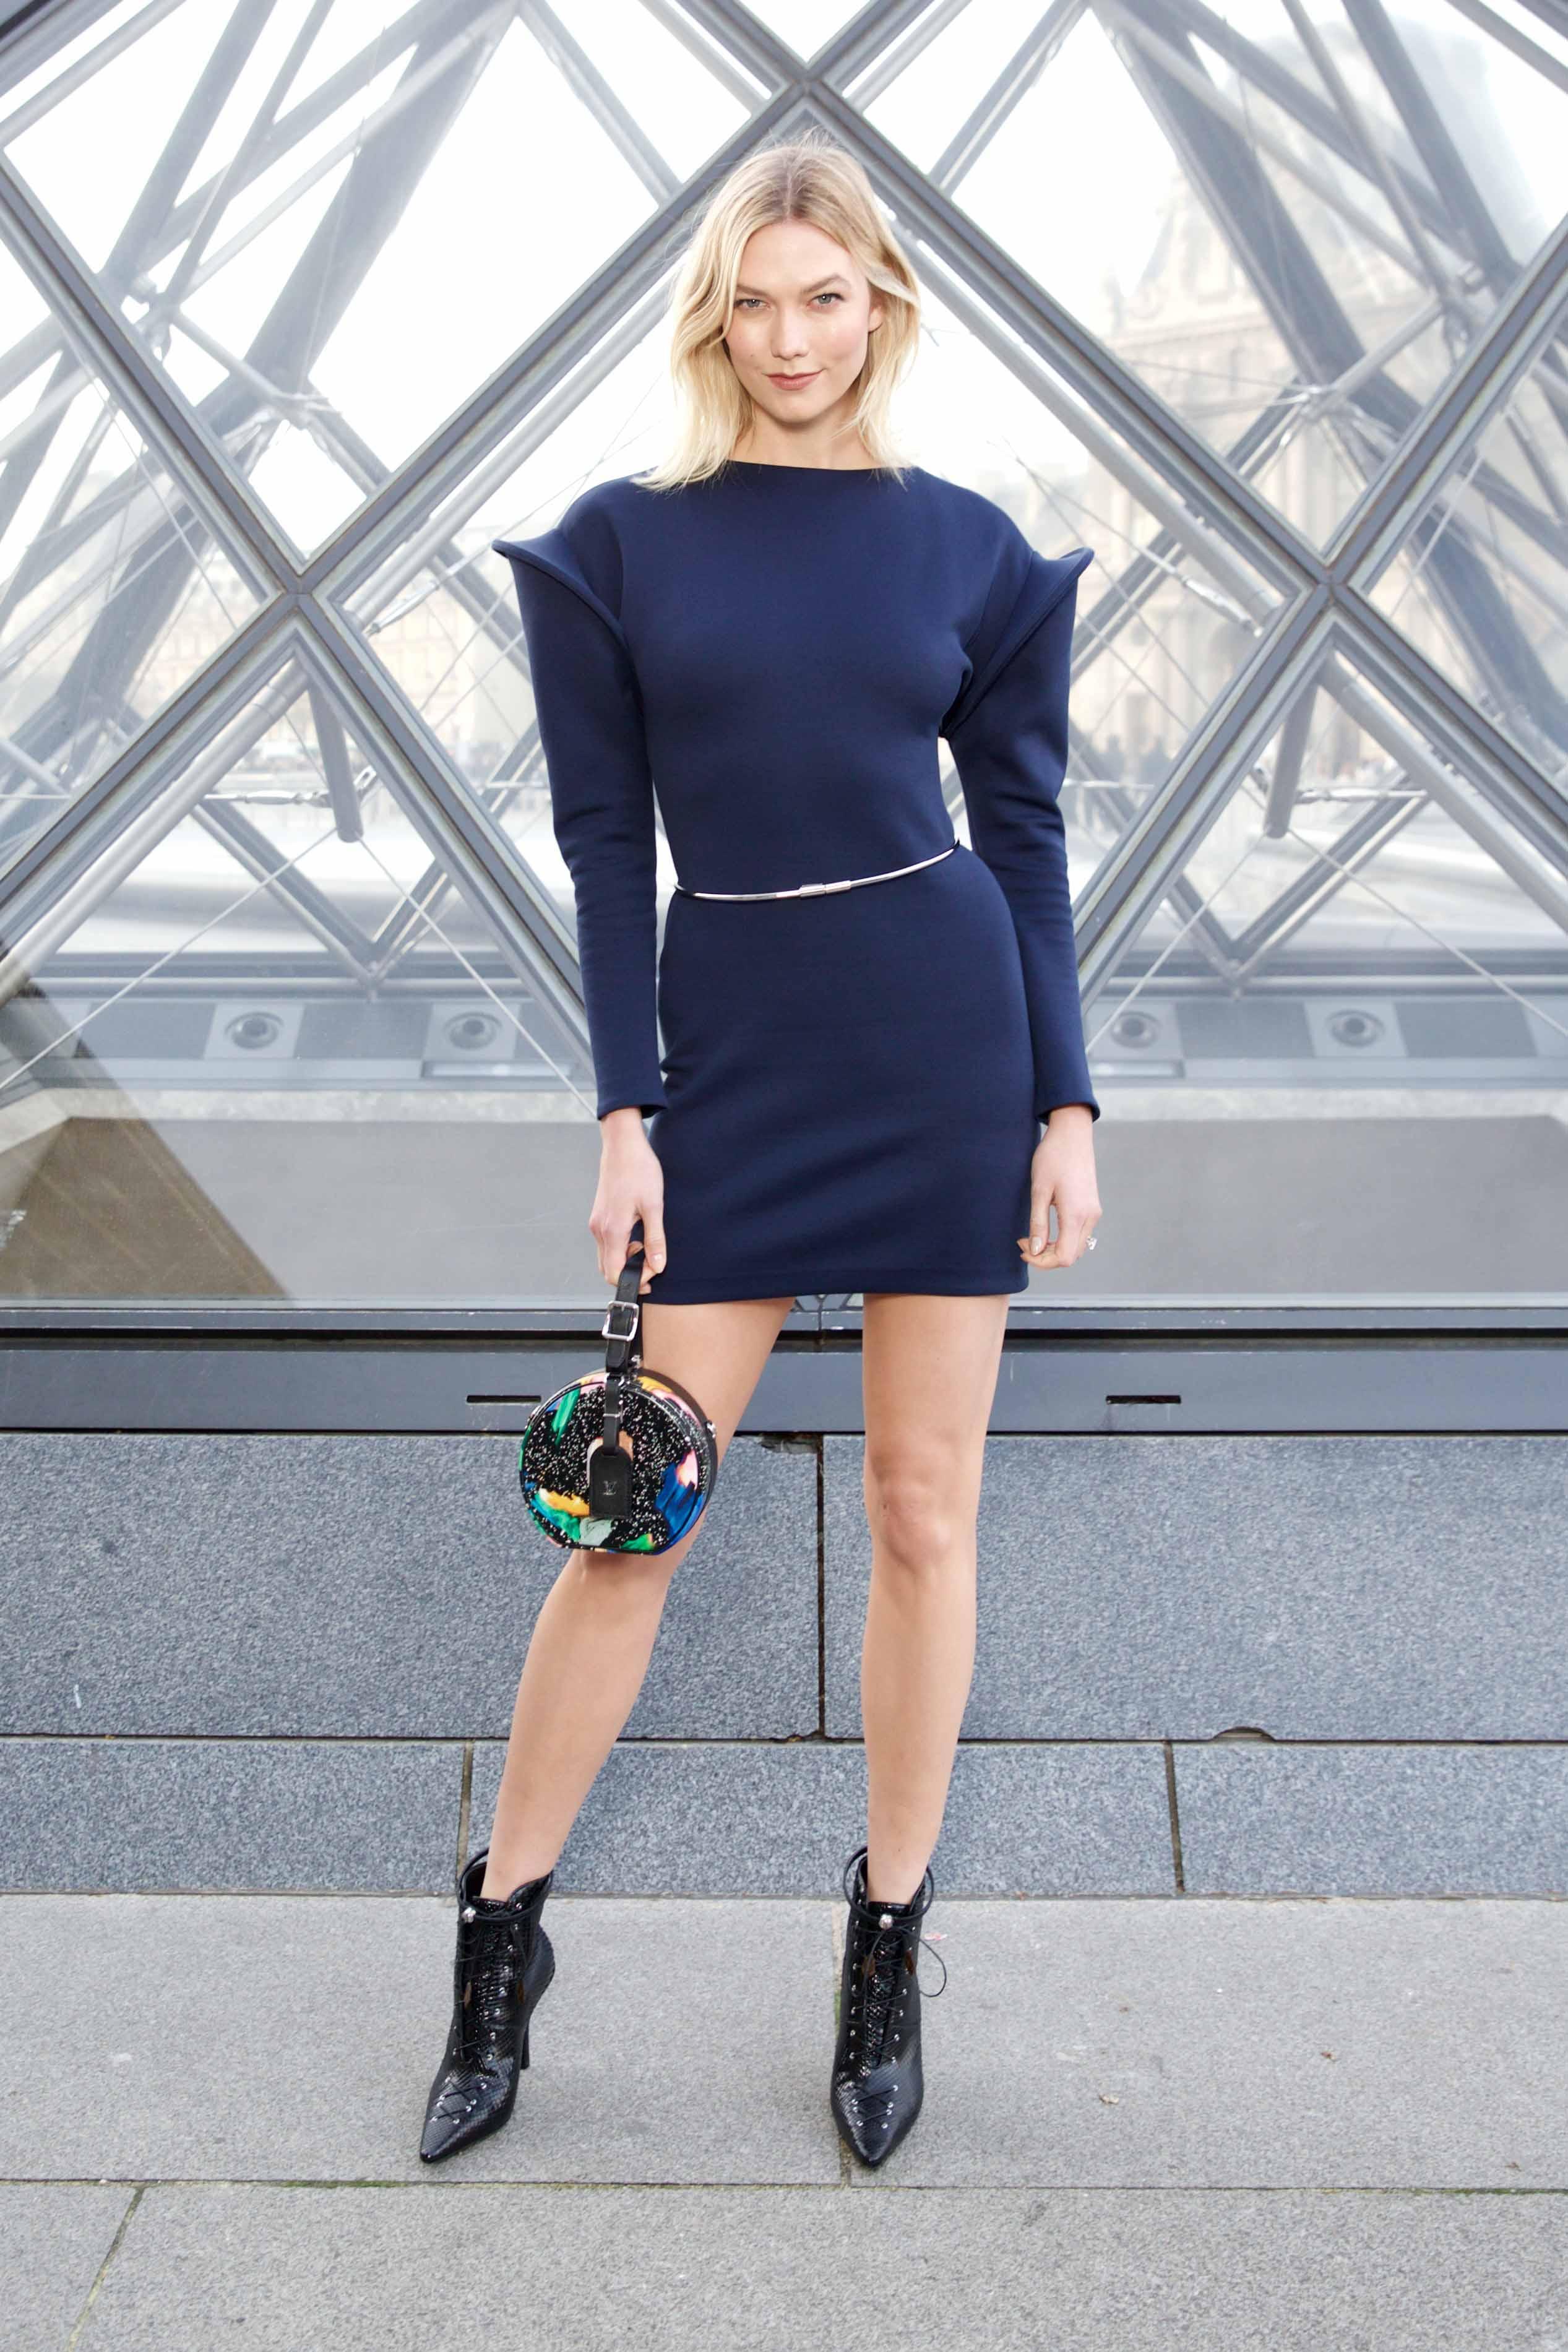 sao hàng ghế đầu tuần lễ thời trang paris show louis vuitton 2